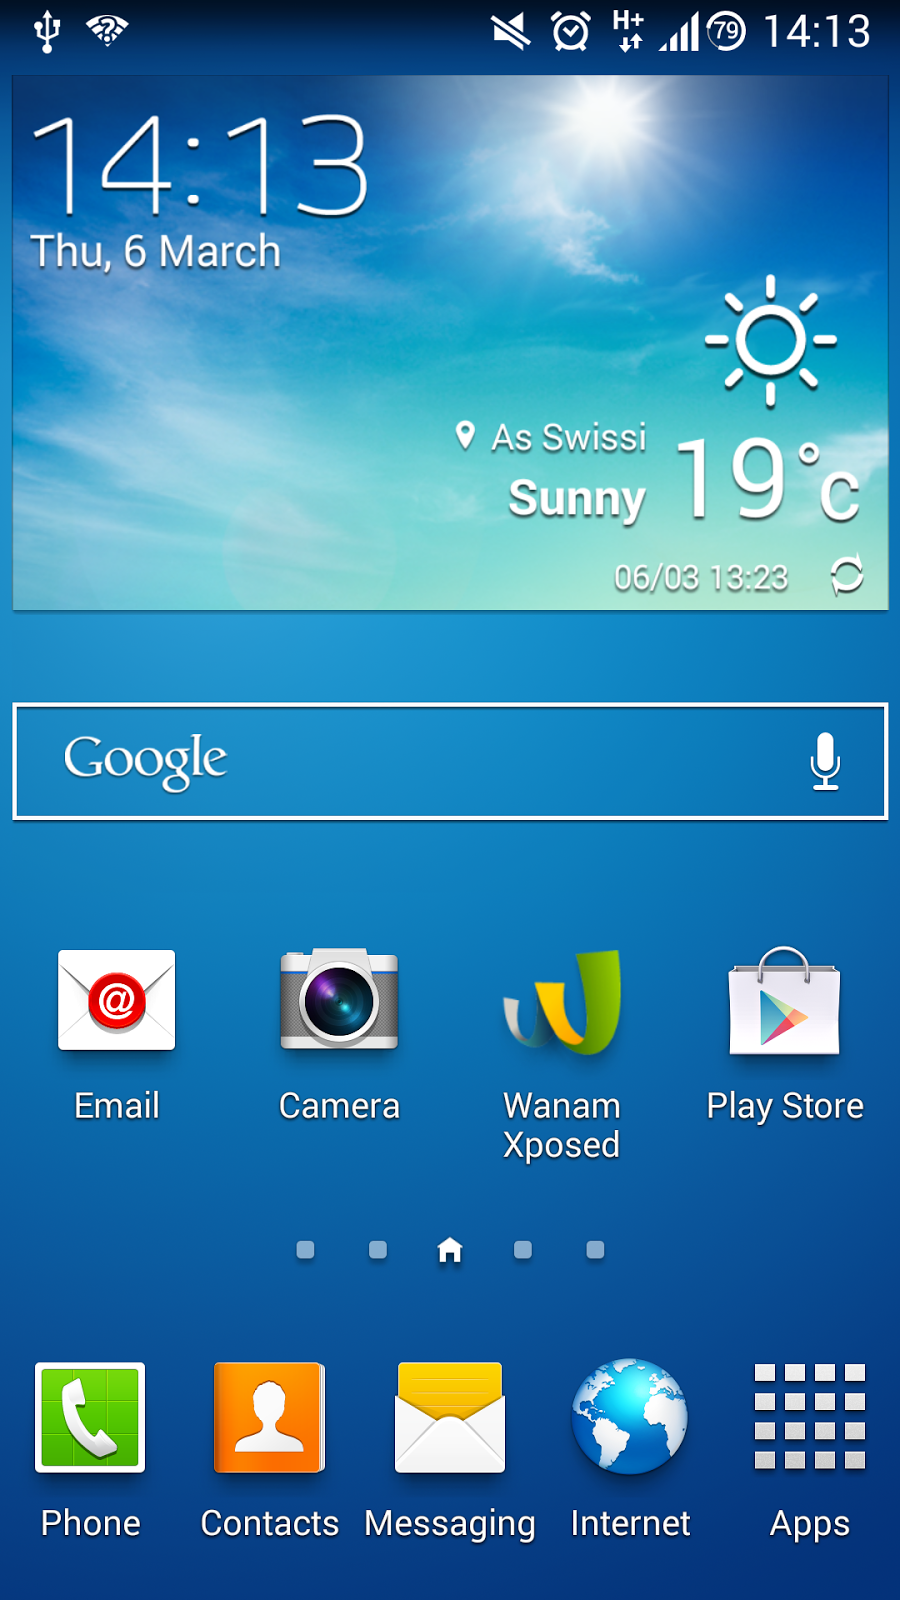 WanamLite ROM se actualiza a la versión 2.7 Galaxy S4 I9505 [XXUGNE8] Android KitKat 4.4.2